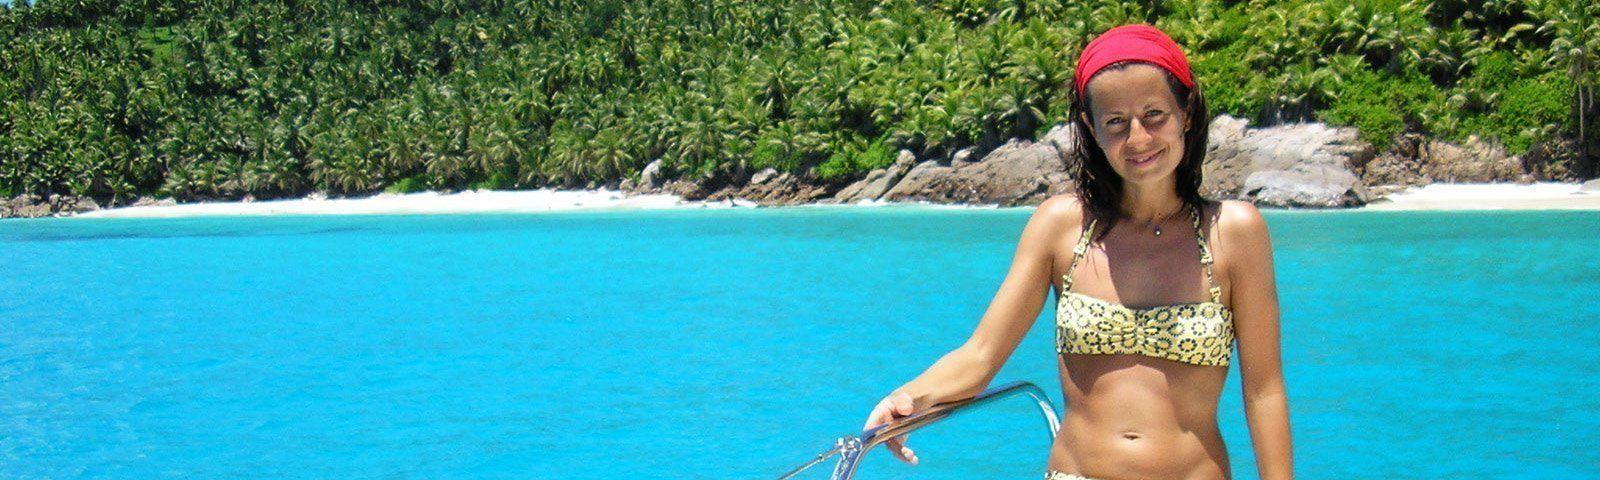 travesia-tailandia-barco-catamaran (9)